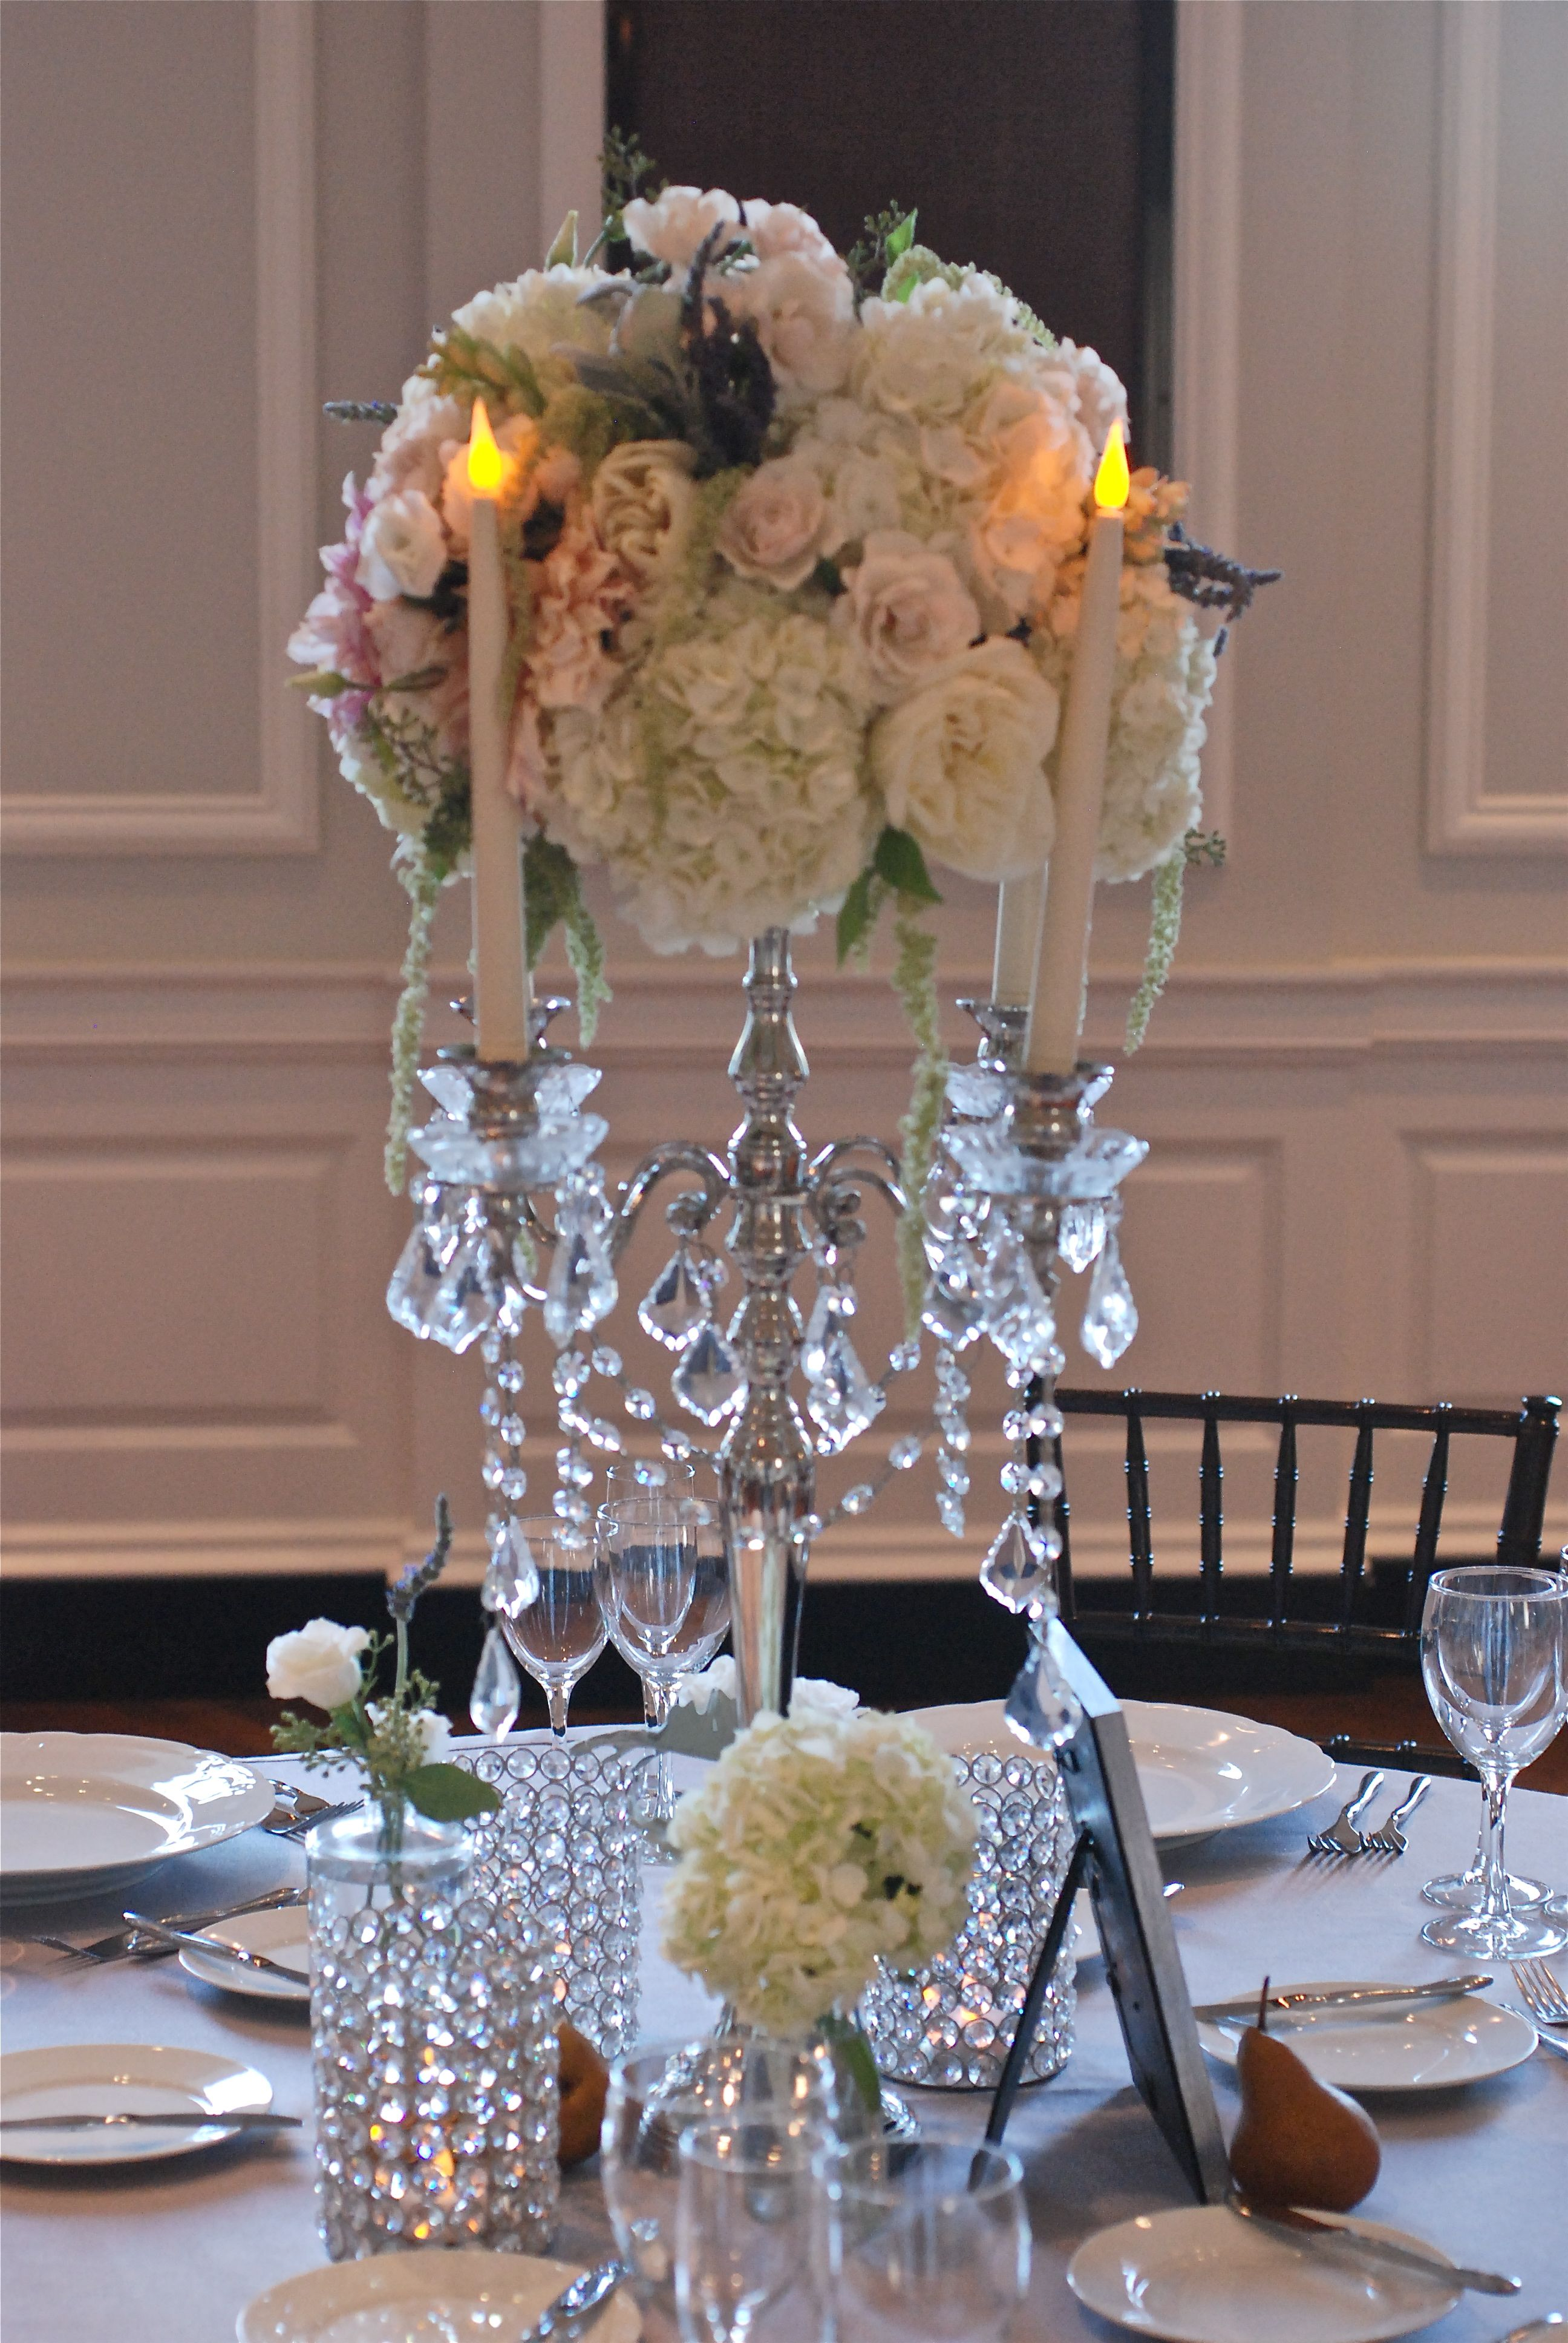 Pin By Events By Ebony On Flower Arrangements Pinterest Wedding